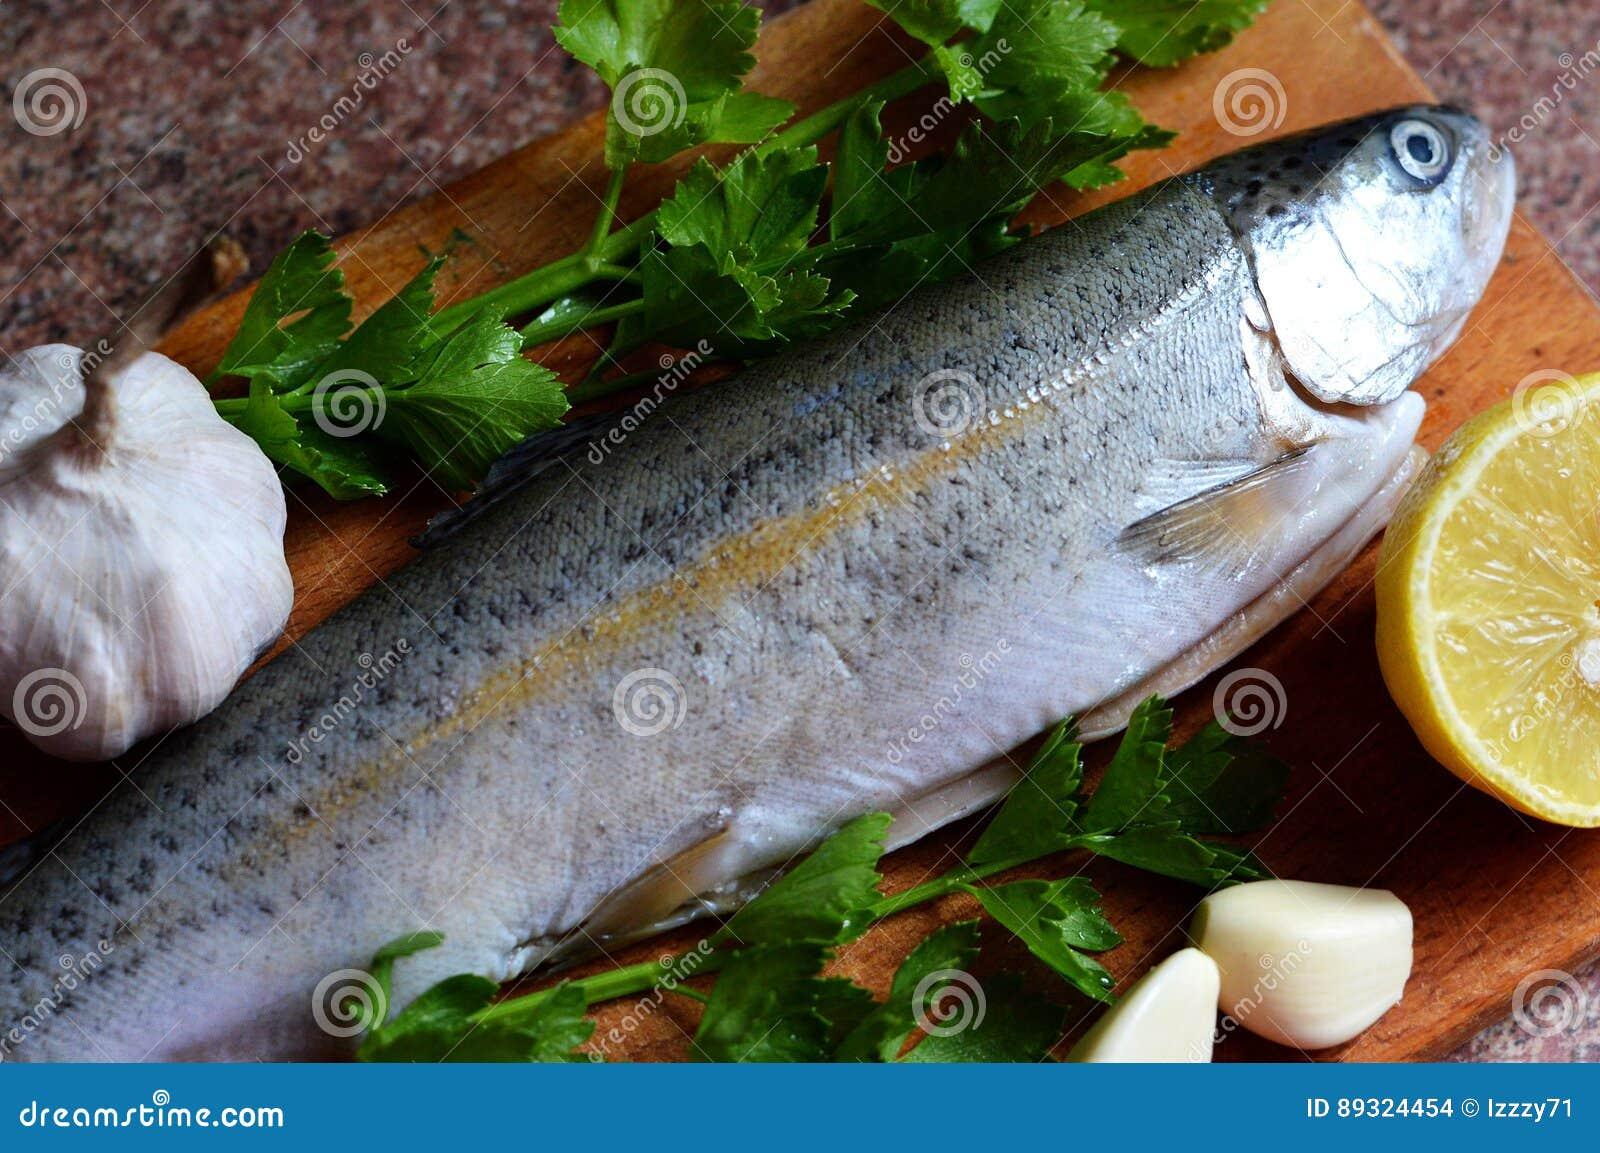 Fresh raw trout on kitchen board